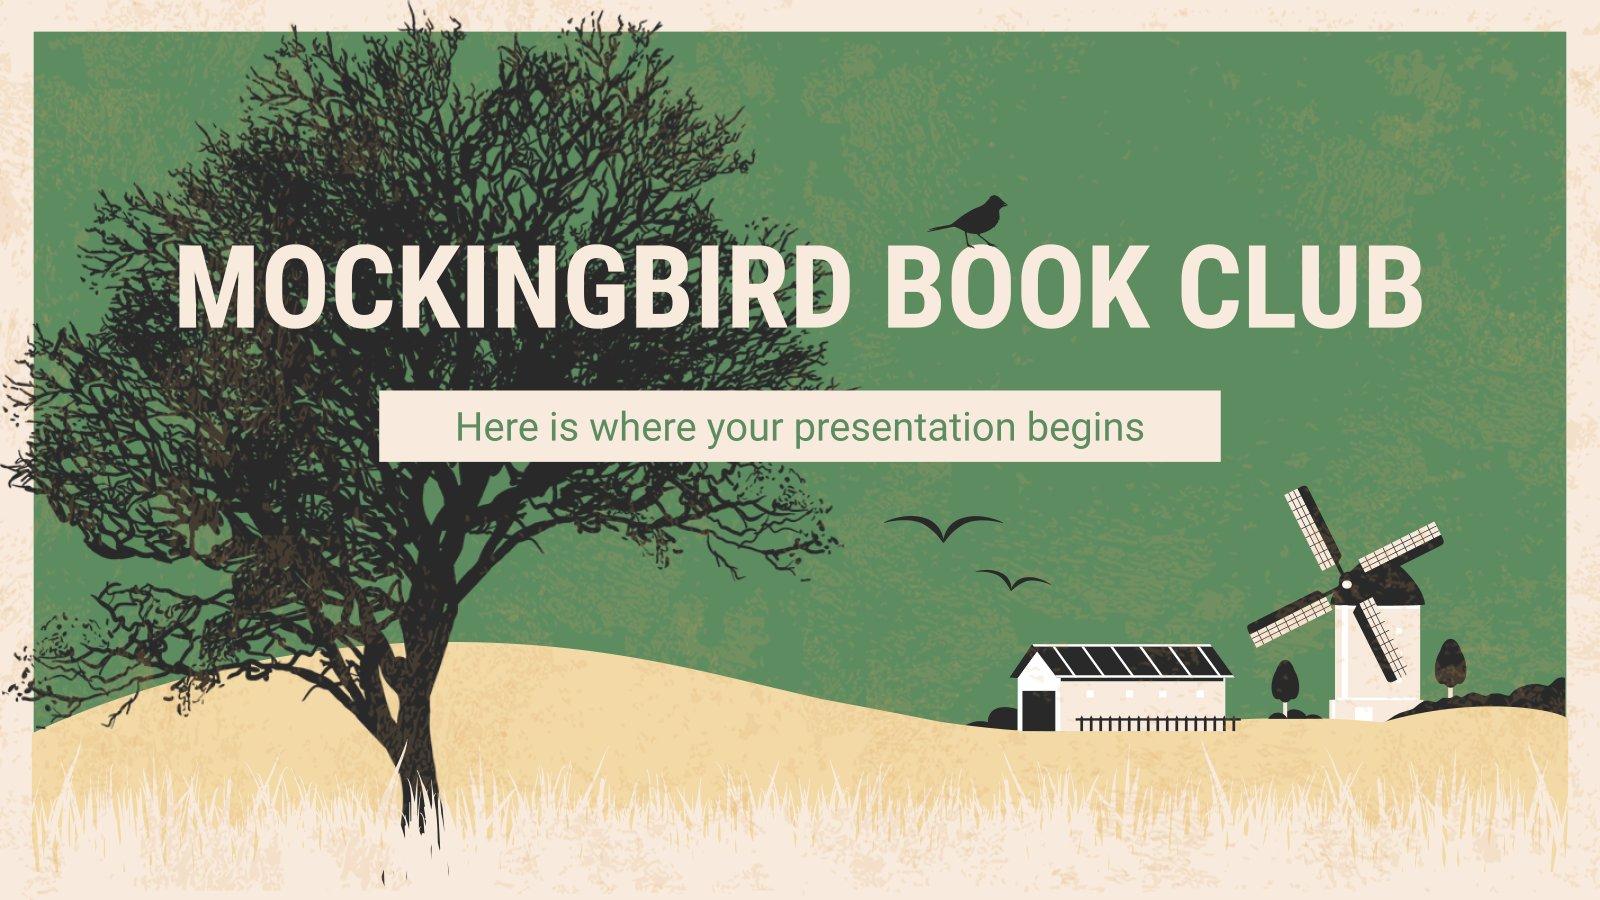 Nachtigall Buchclub Präsentationsvorlage